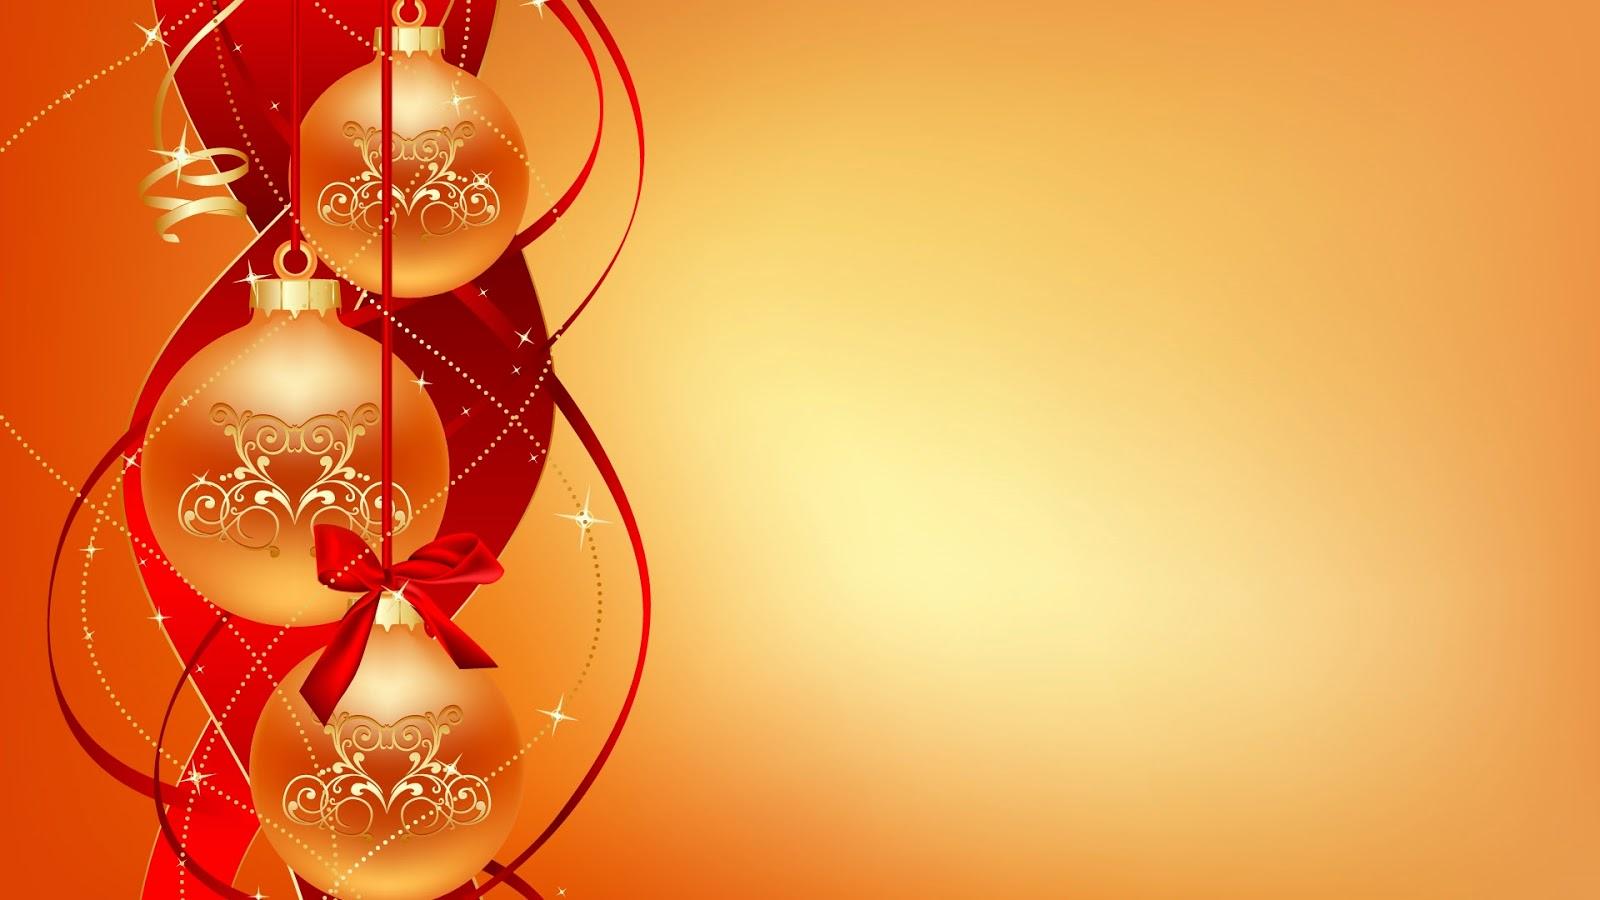 Www Alone Girl Wallpapers Com Imagenes Hilandy Fondo De Pantalla Navidad Bolas Naranjas